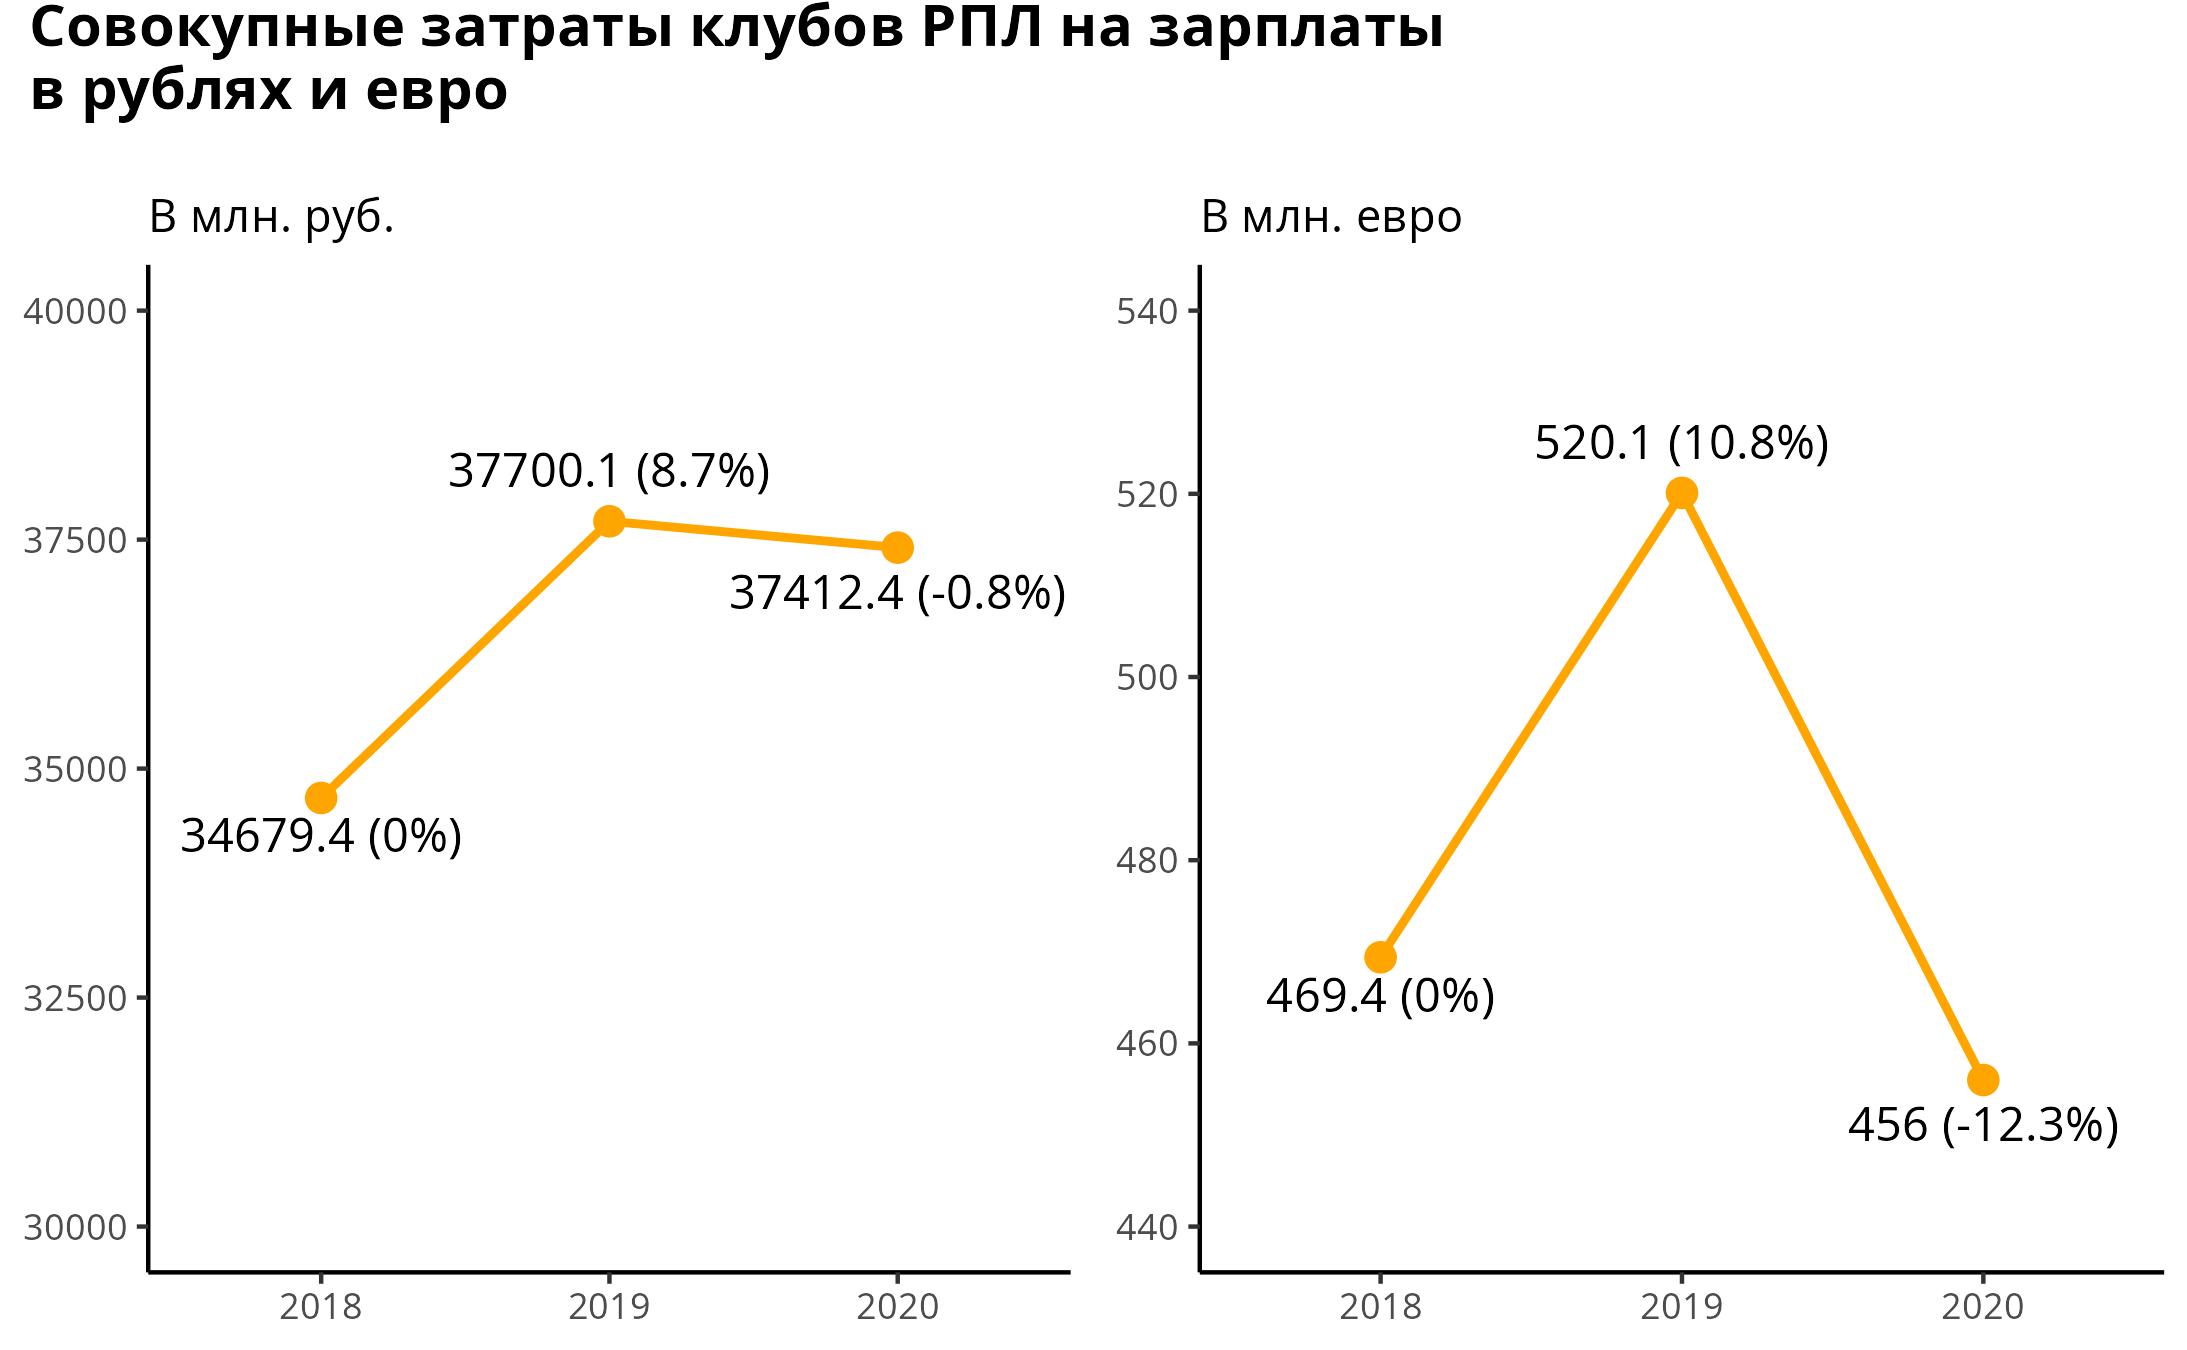 Стало ли в РПЛ меньше денег за последние 3 года?